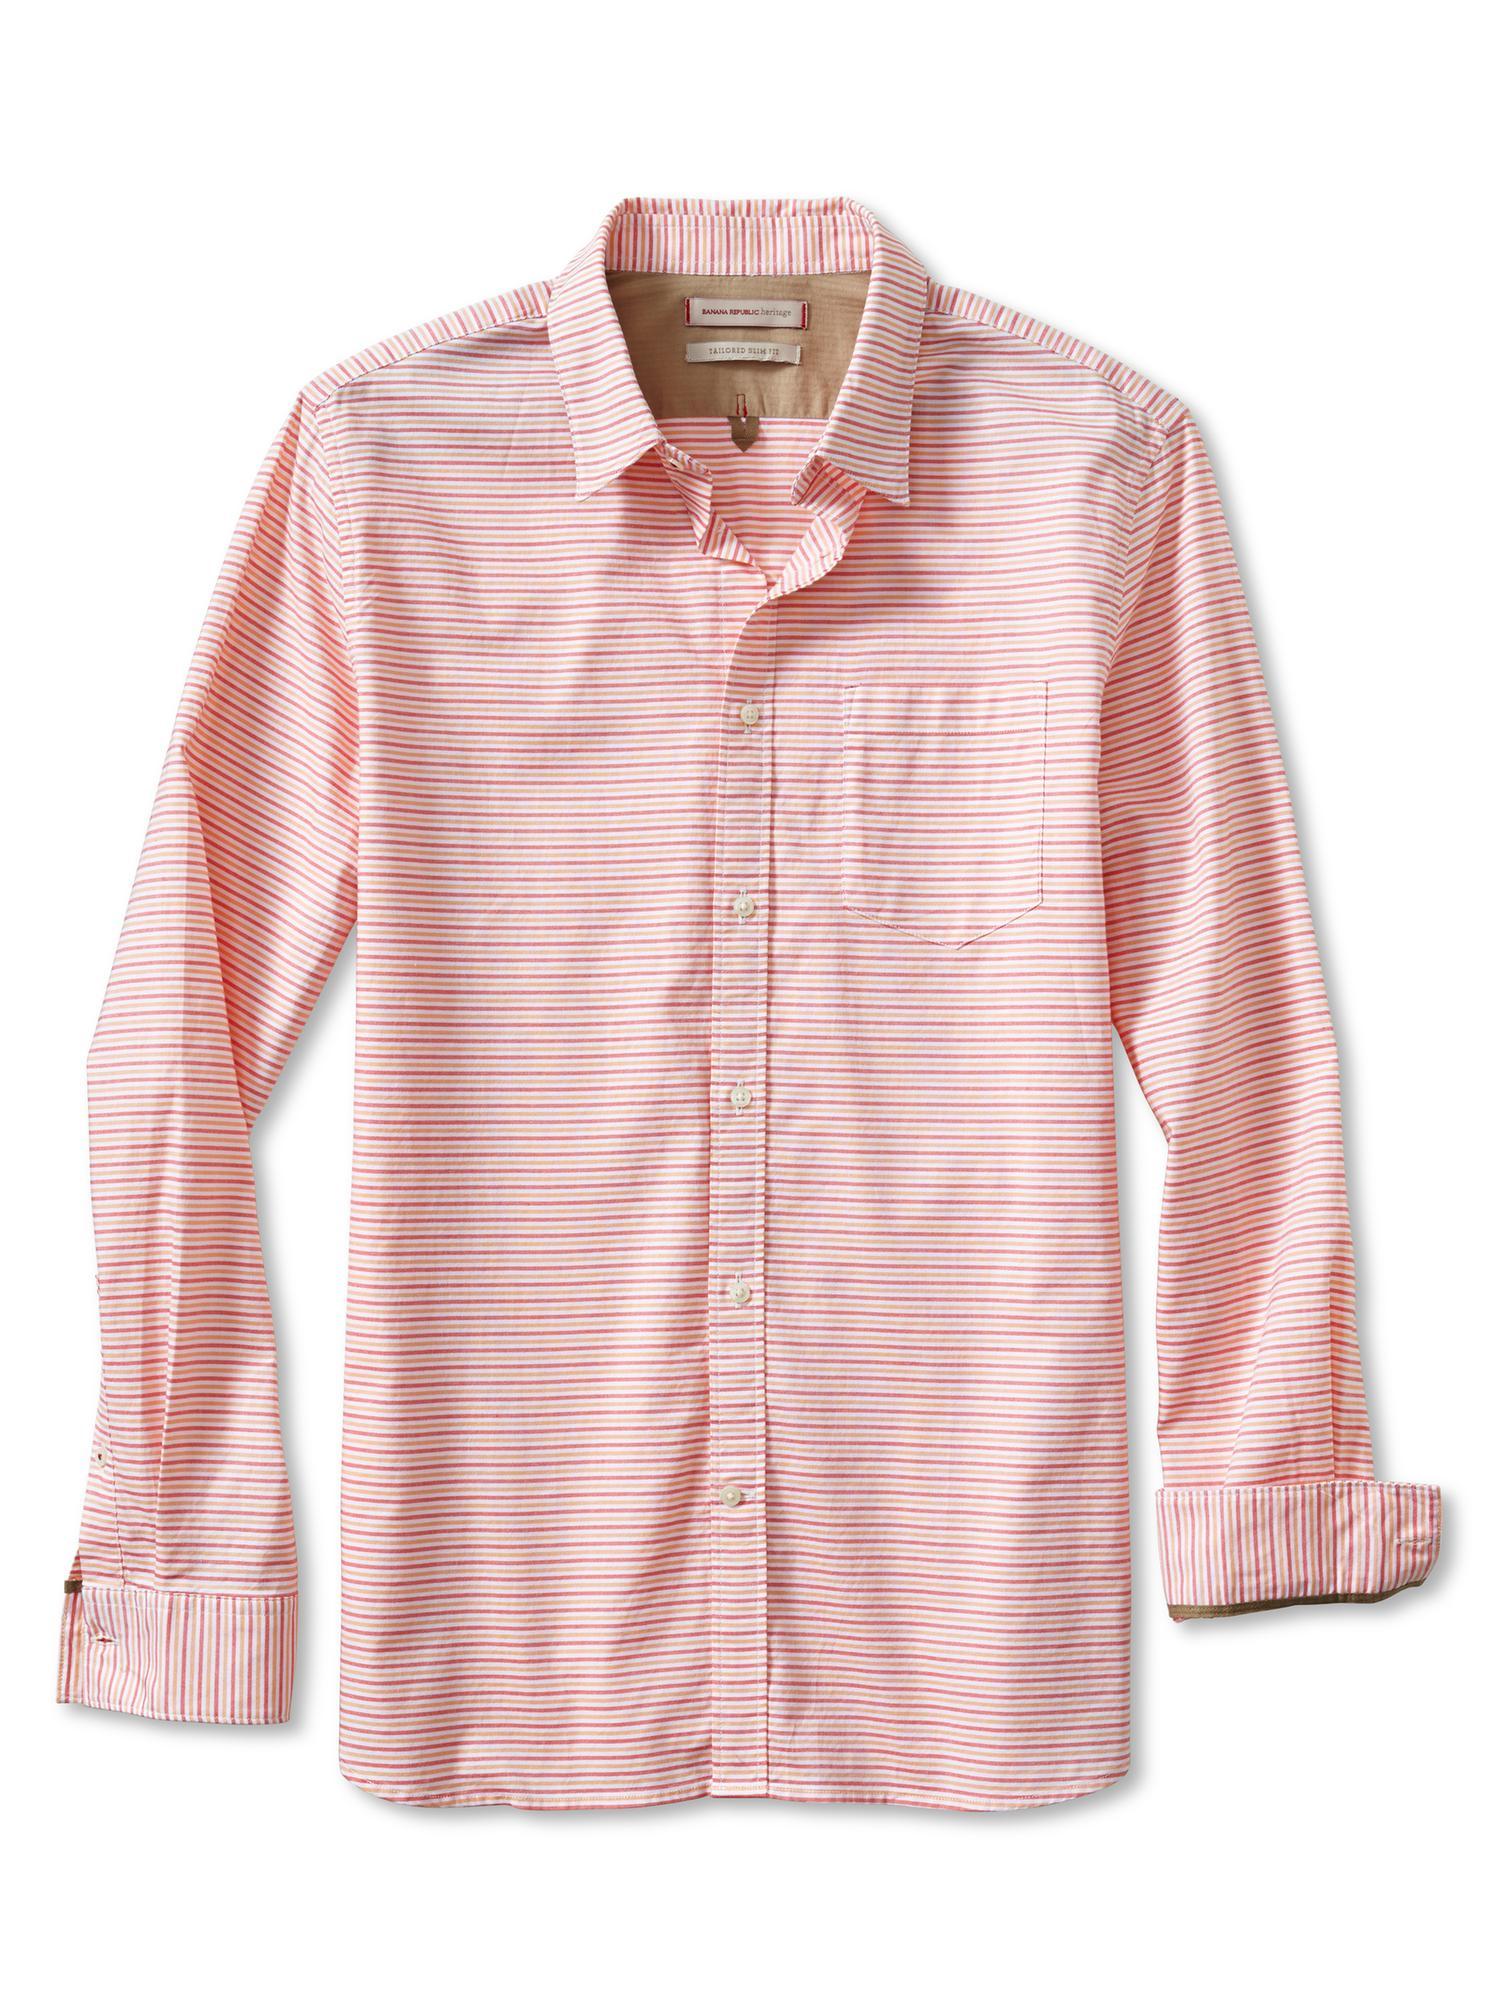 Banana republic heritage horizontal stripe shirt sunkissed for Horizontal striped dress shirts men